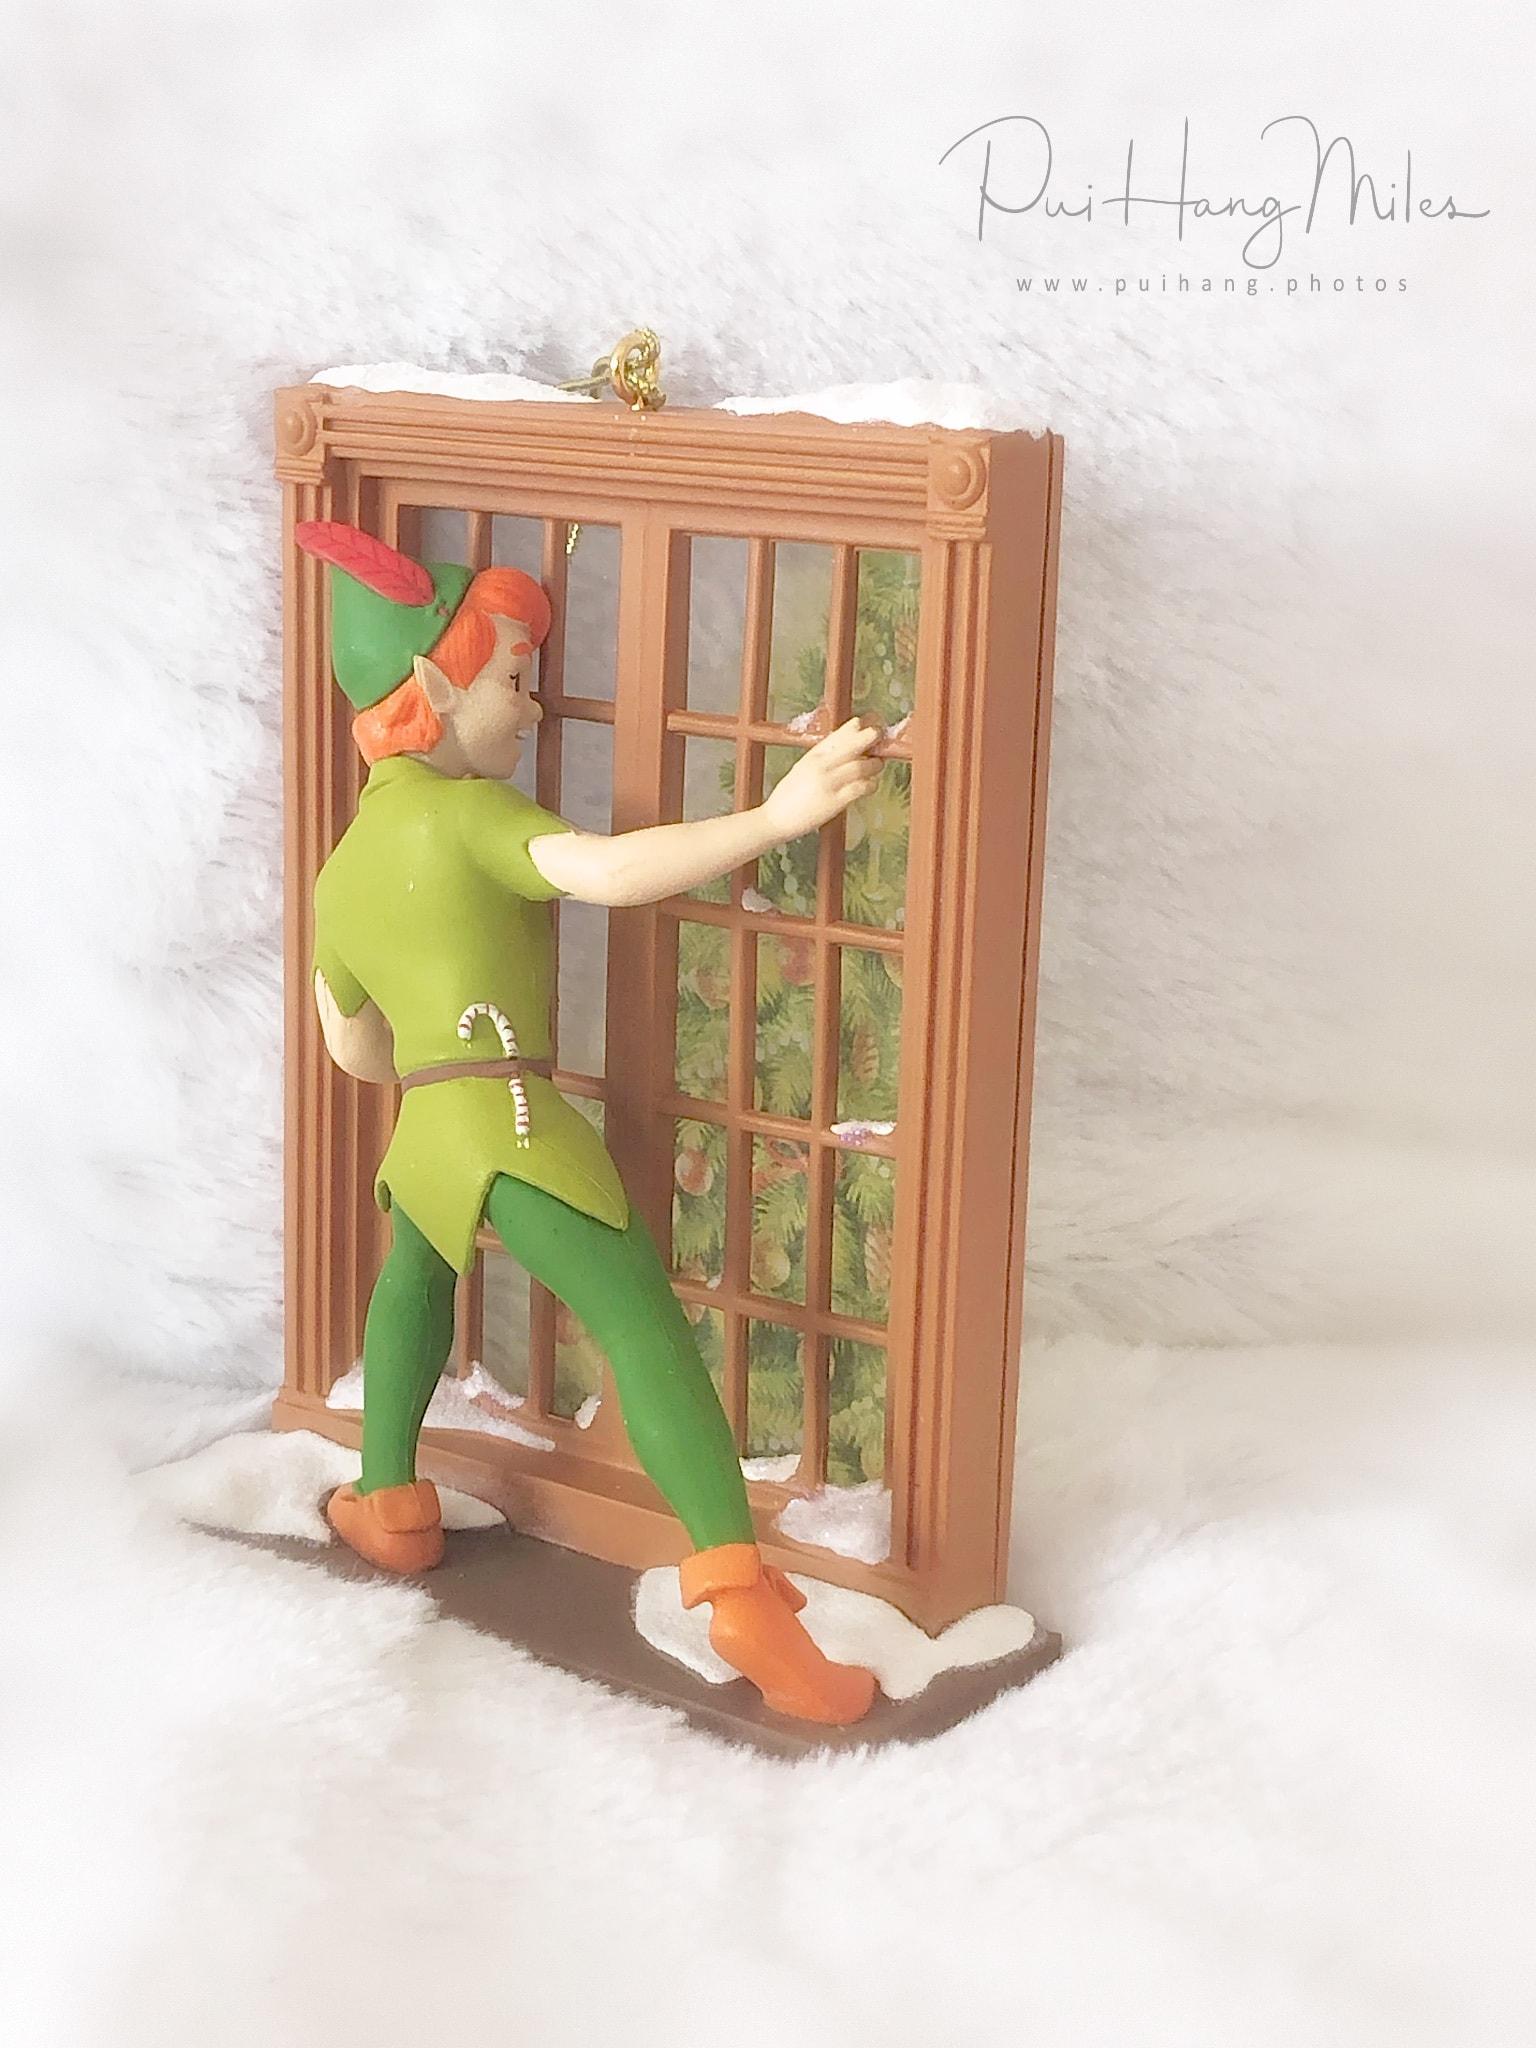 Peter Pan looking through the window